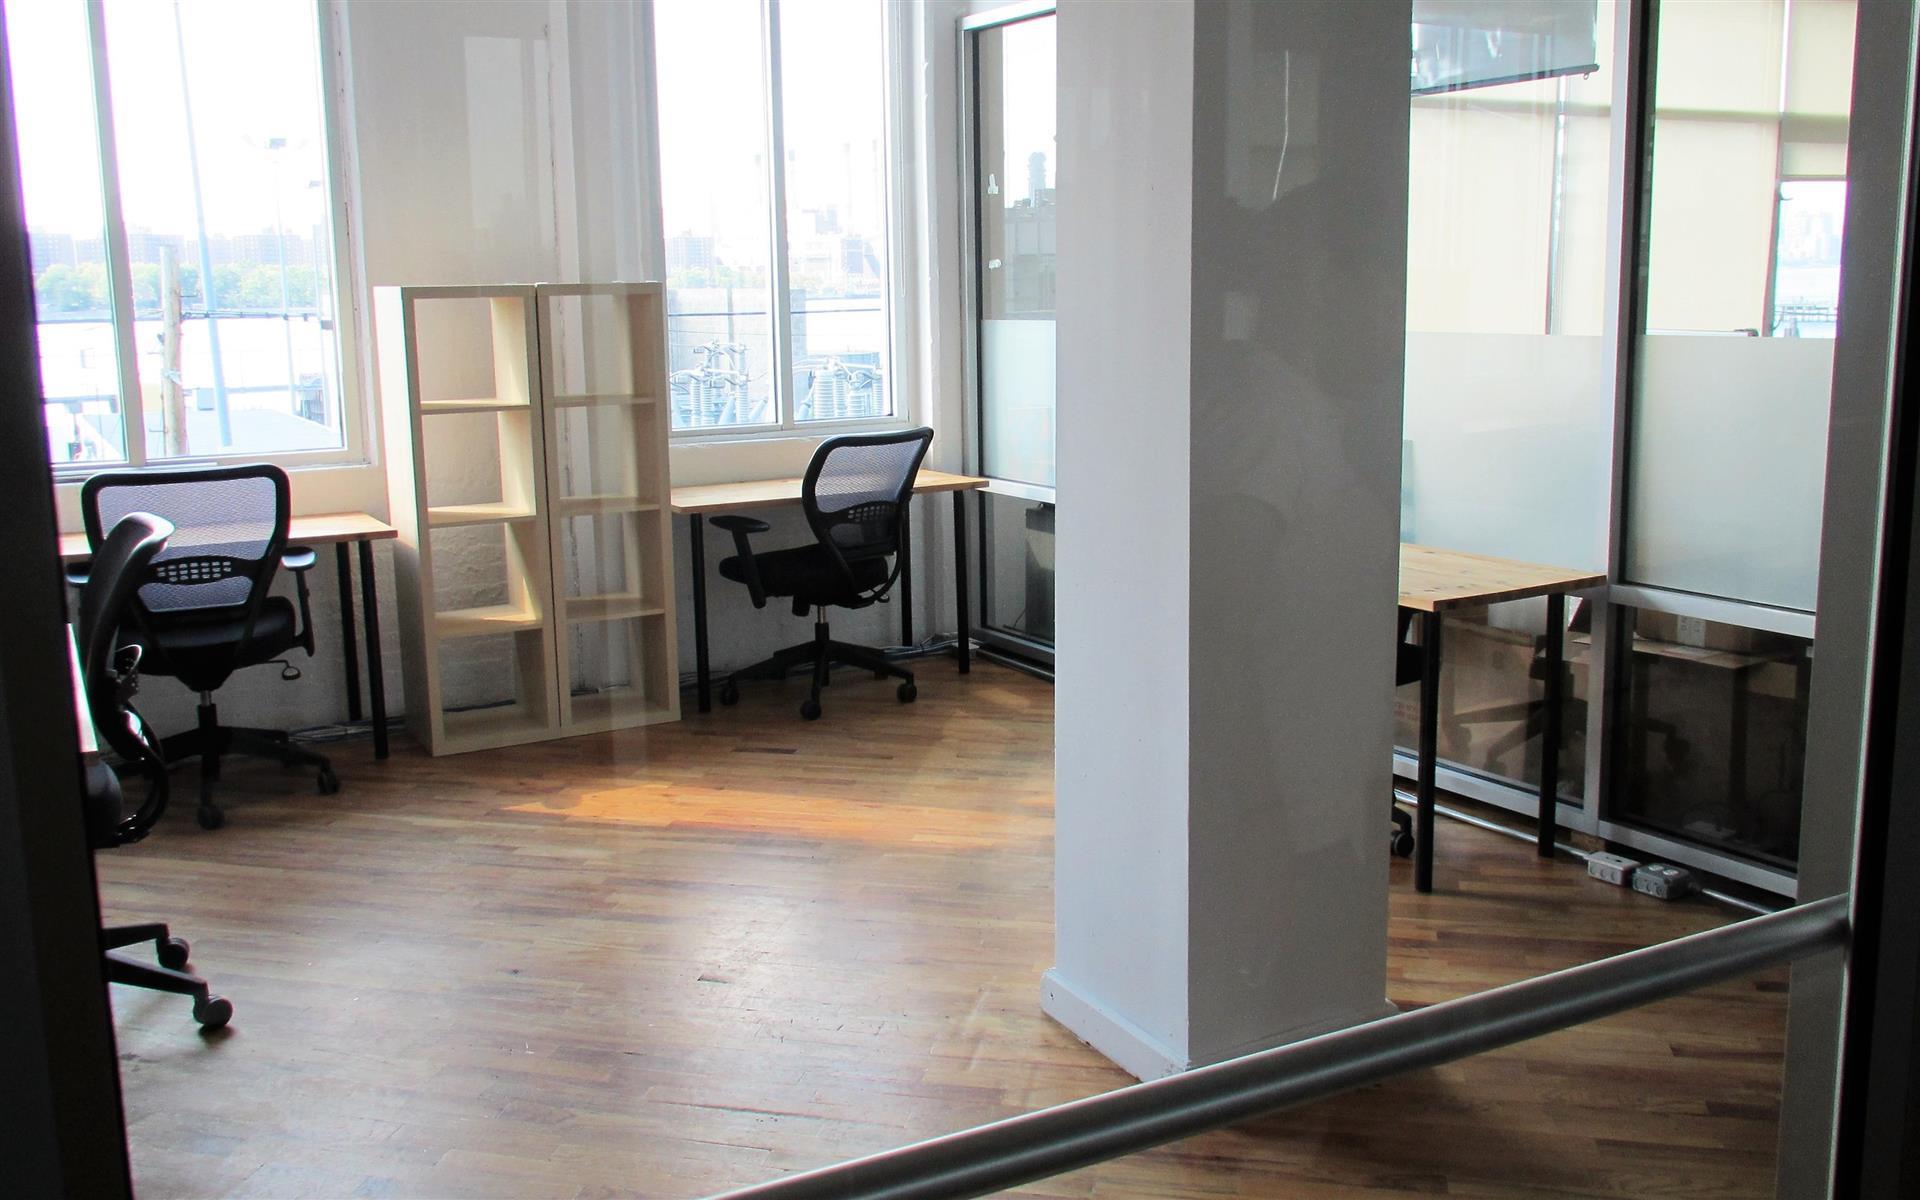 Green Desk - 240 Kent Ave - Spacious 4 Desk Office